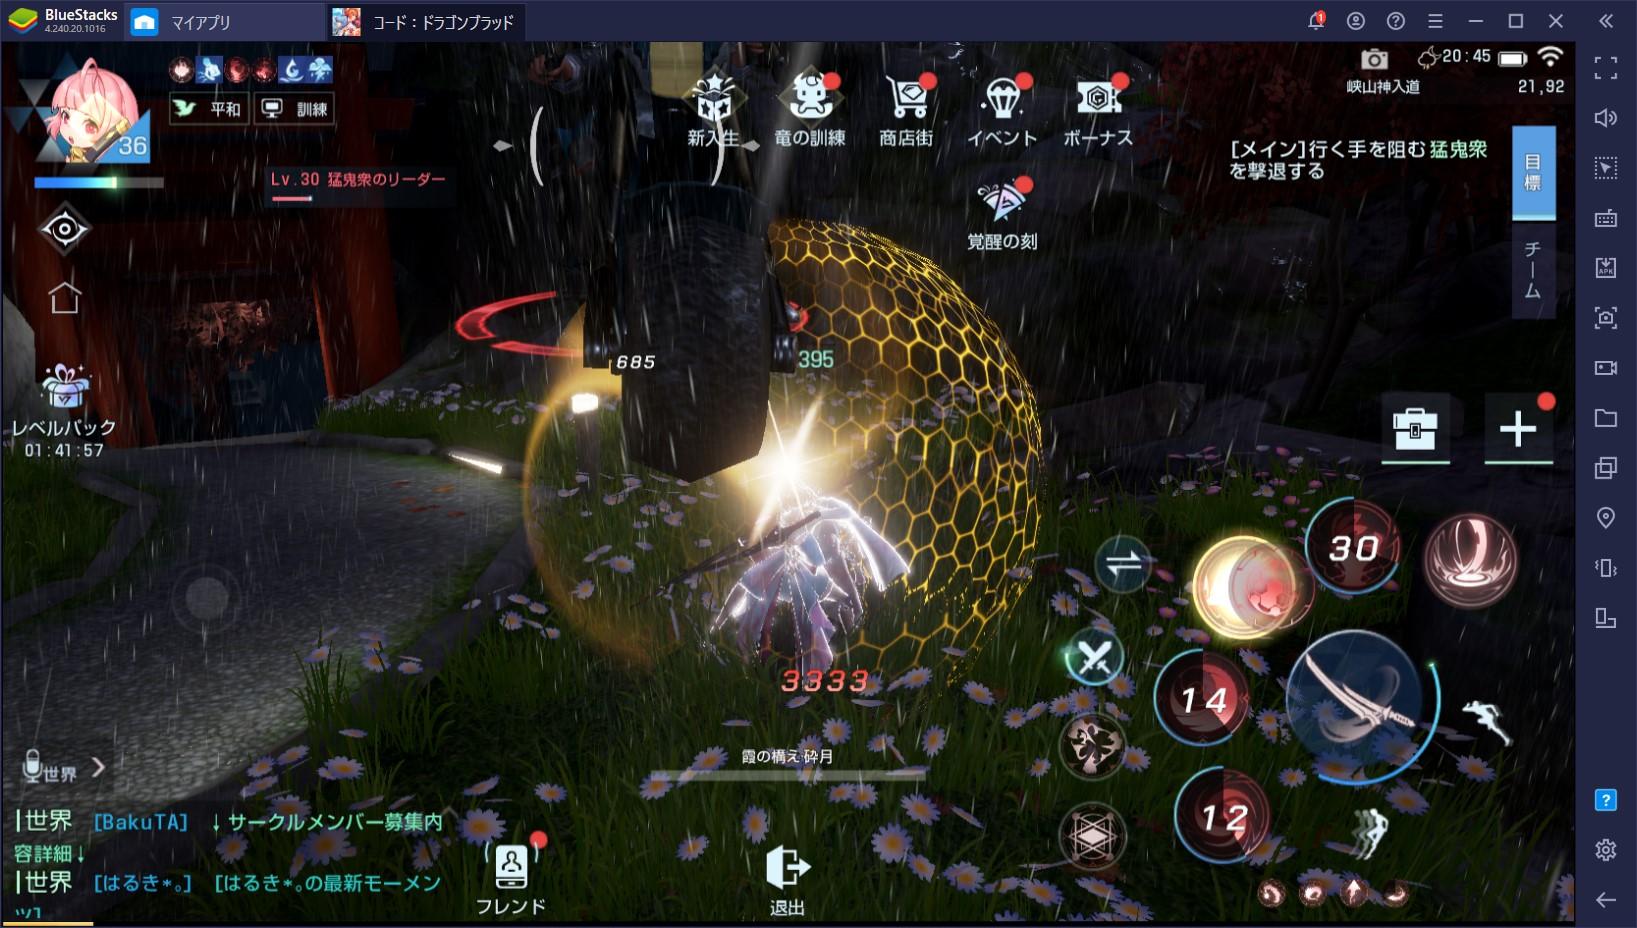 BlueStacks:『コード:ドラゴンブラッド』初心者攻略ガイド